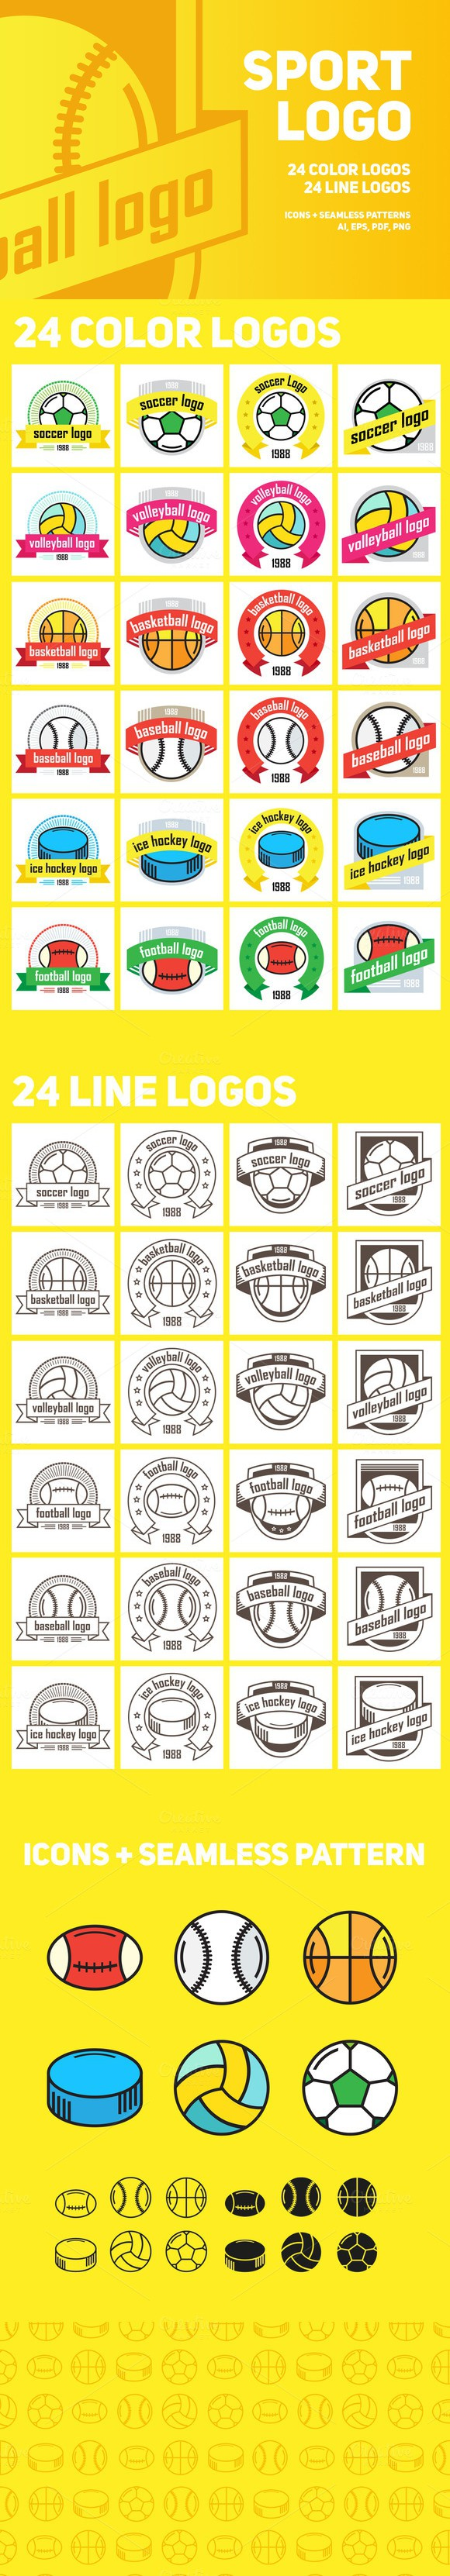 Sport logo | 48 color and line logos. Sport Icons. $9.00